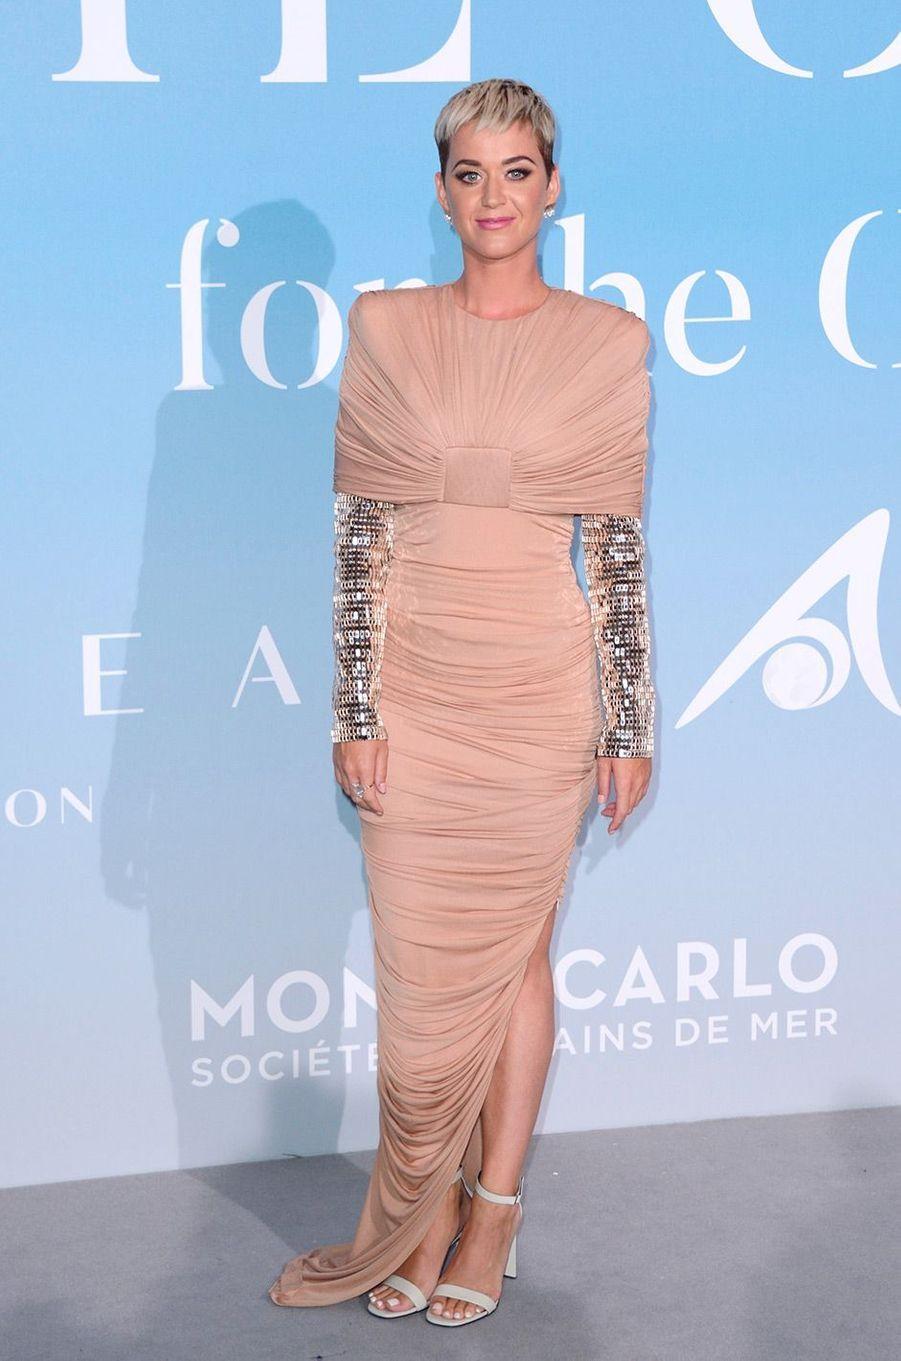 Katy Perry au Gala for the Global Ocean, à Monte-Carlo, mercredi 26 septembre